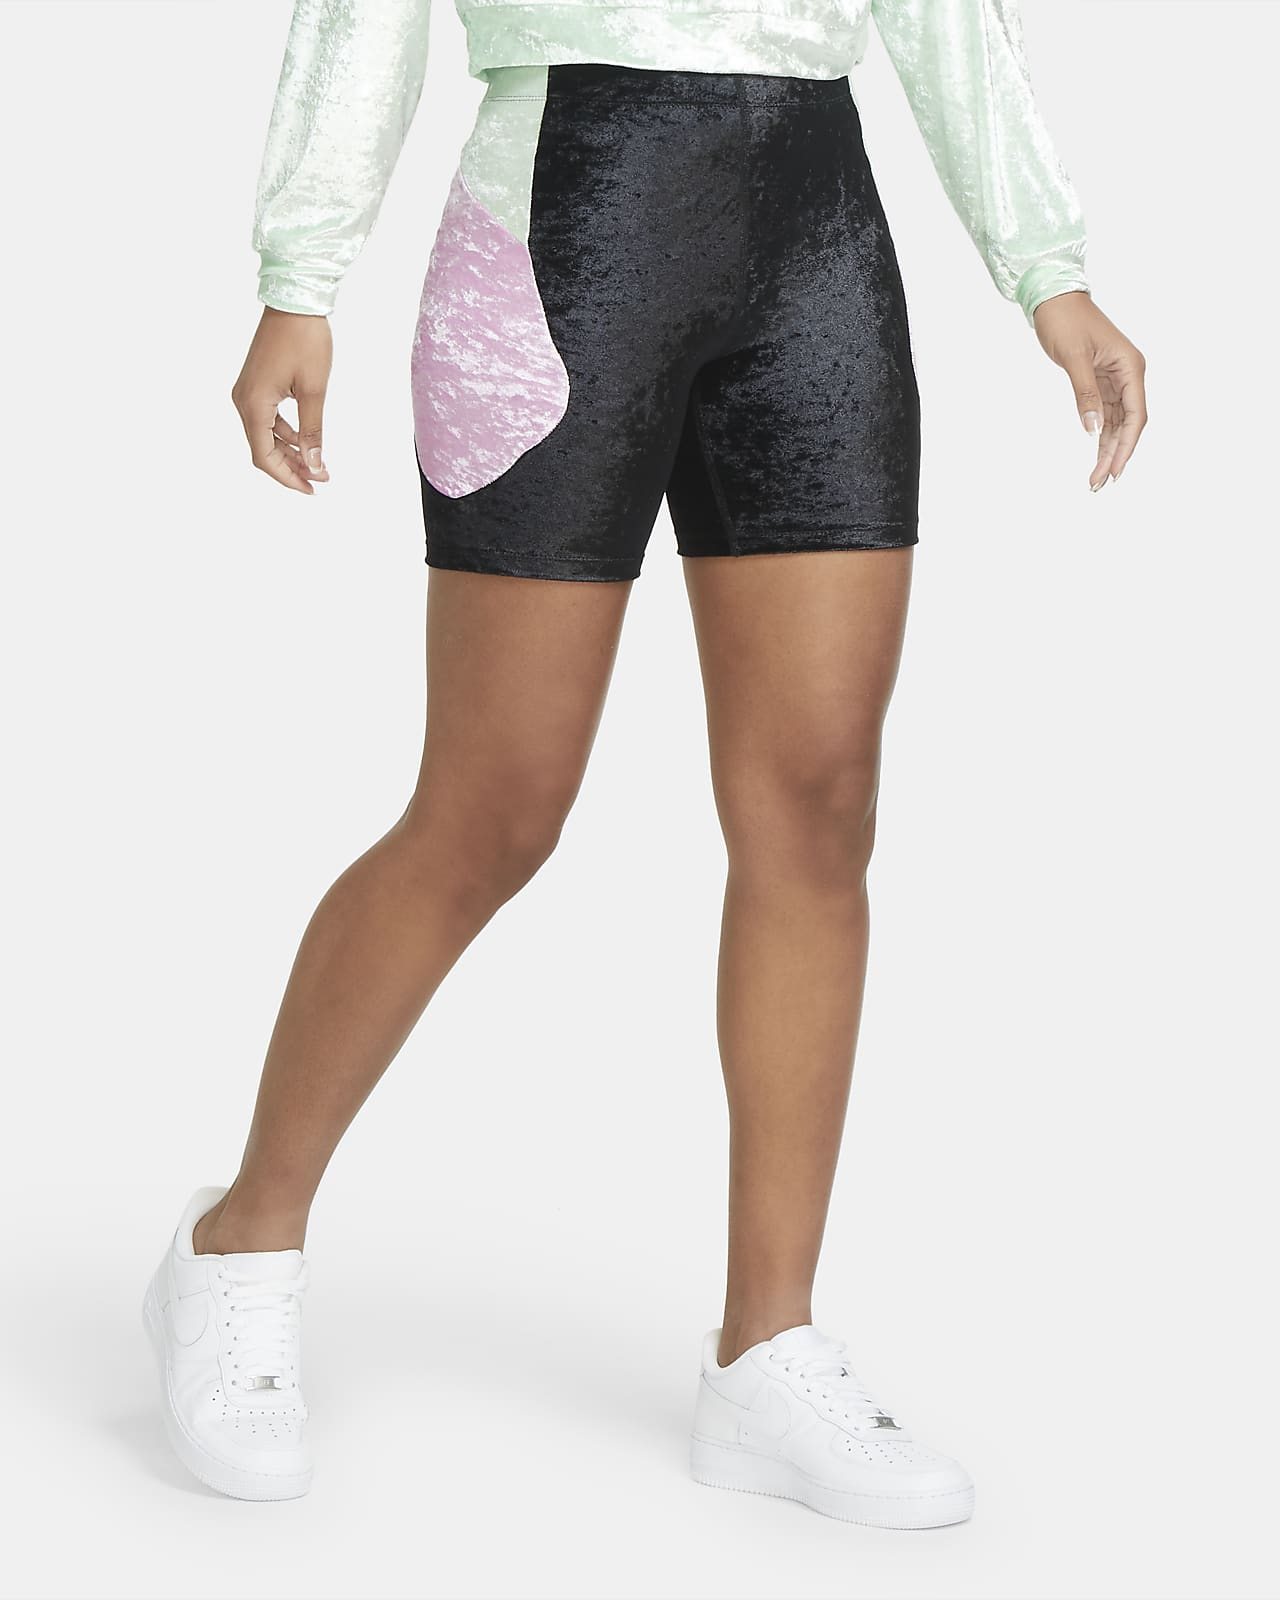 Nike Sportswear Women's Velvet Bike Shorts